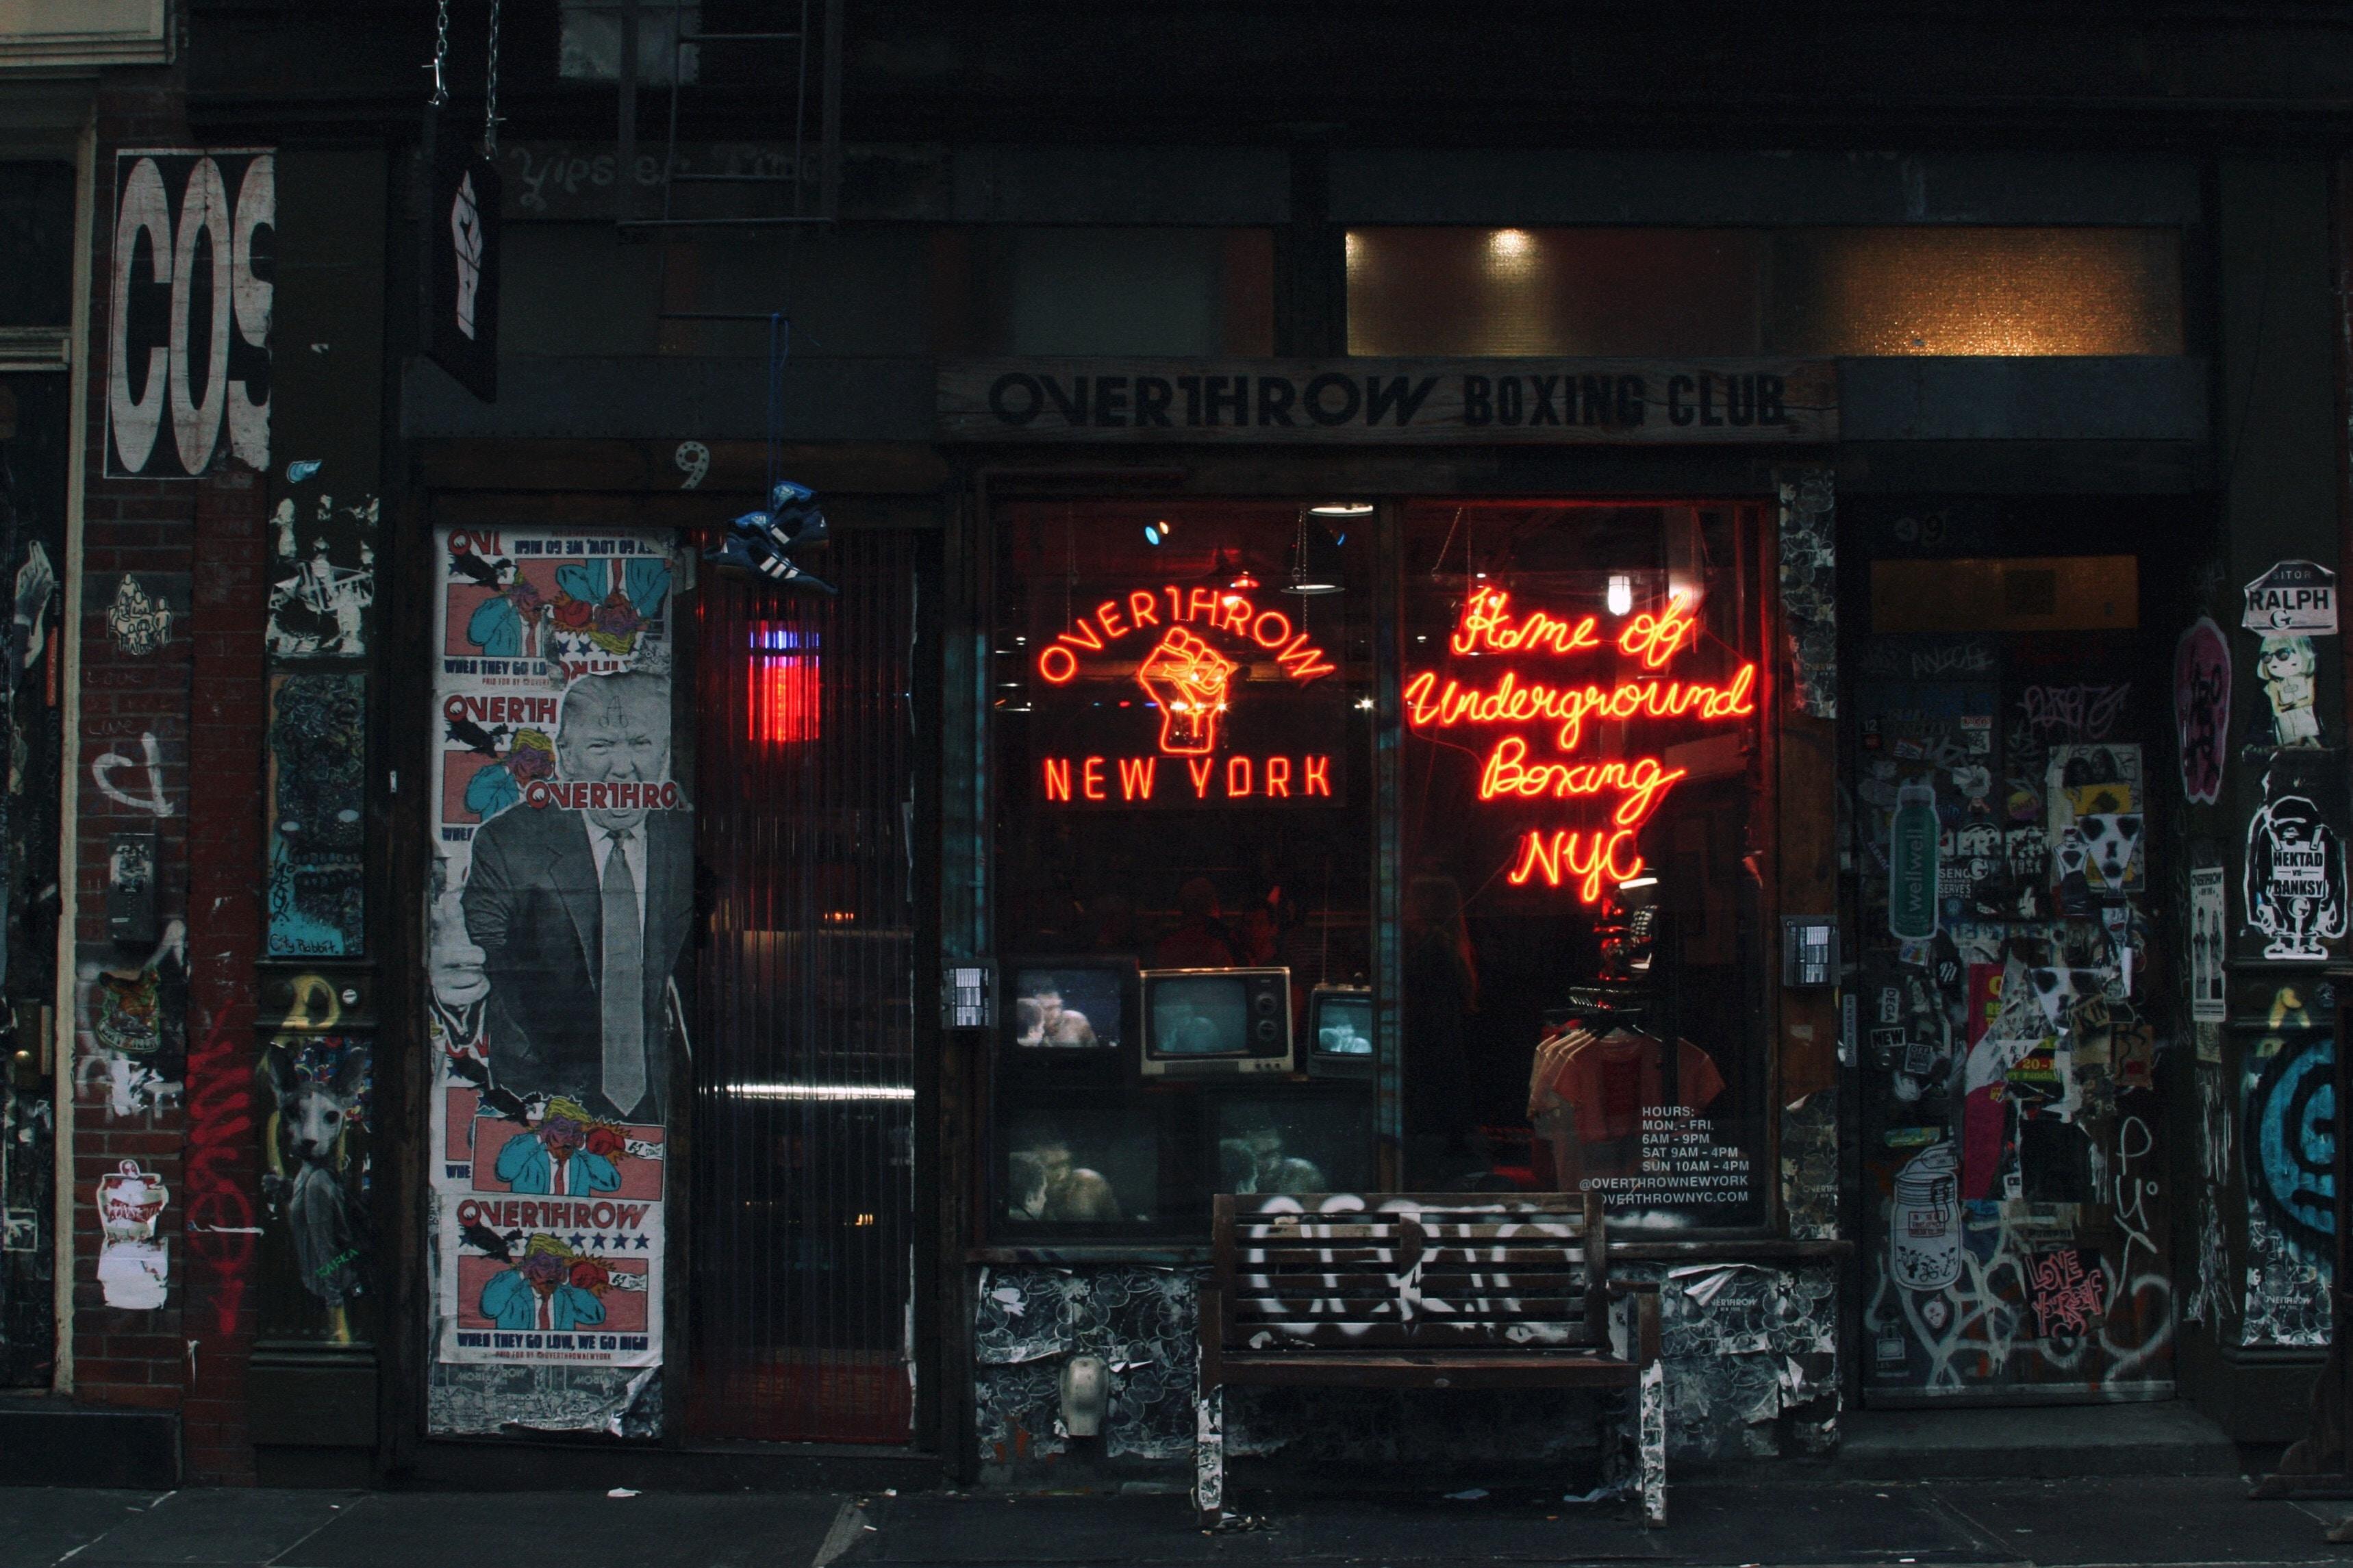 New York Overthrow boxing club